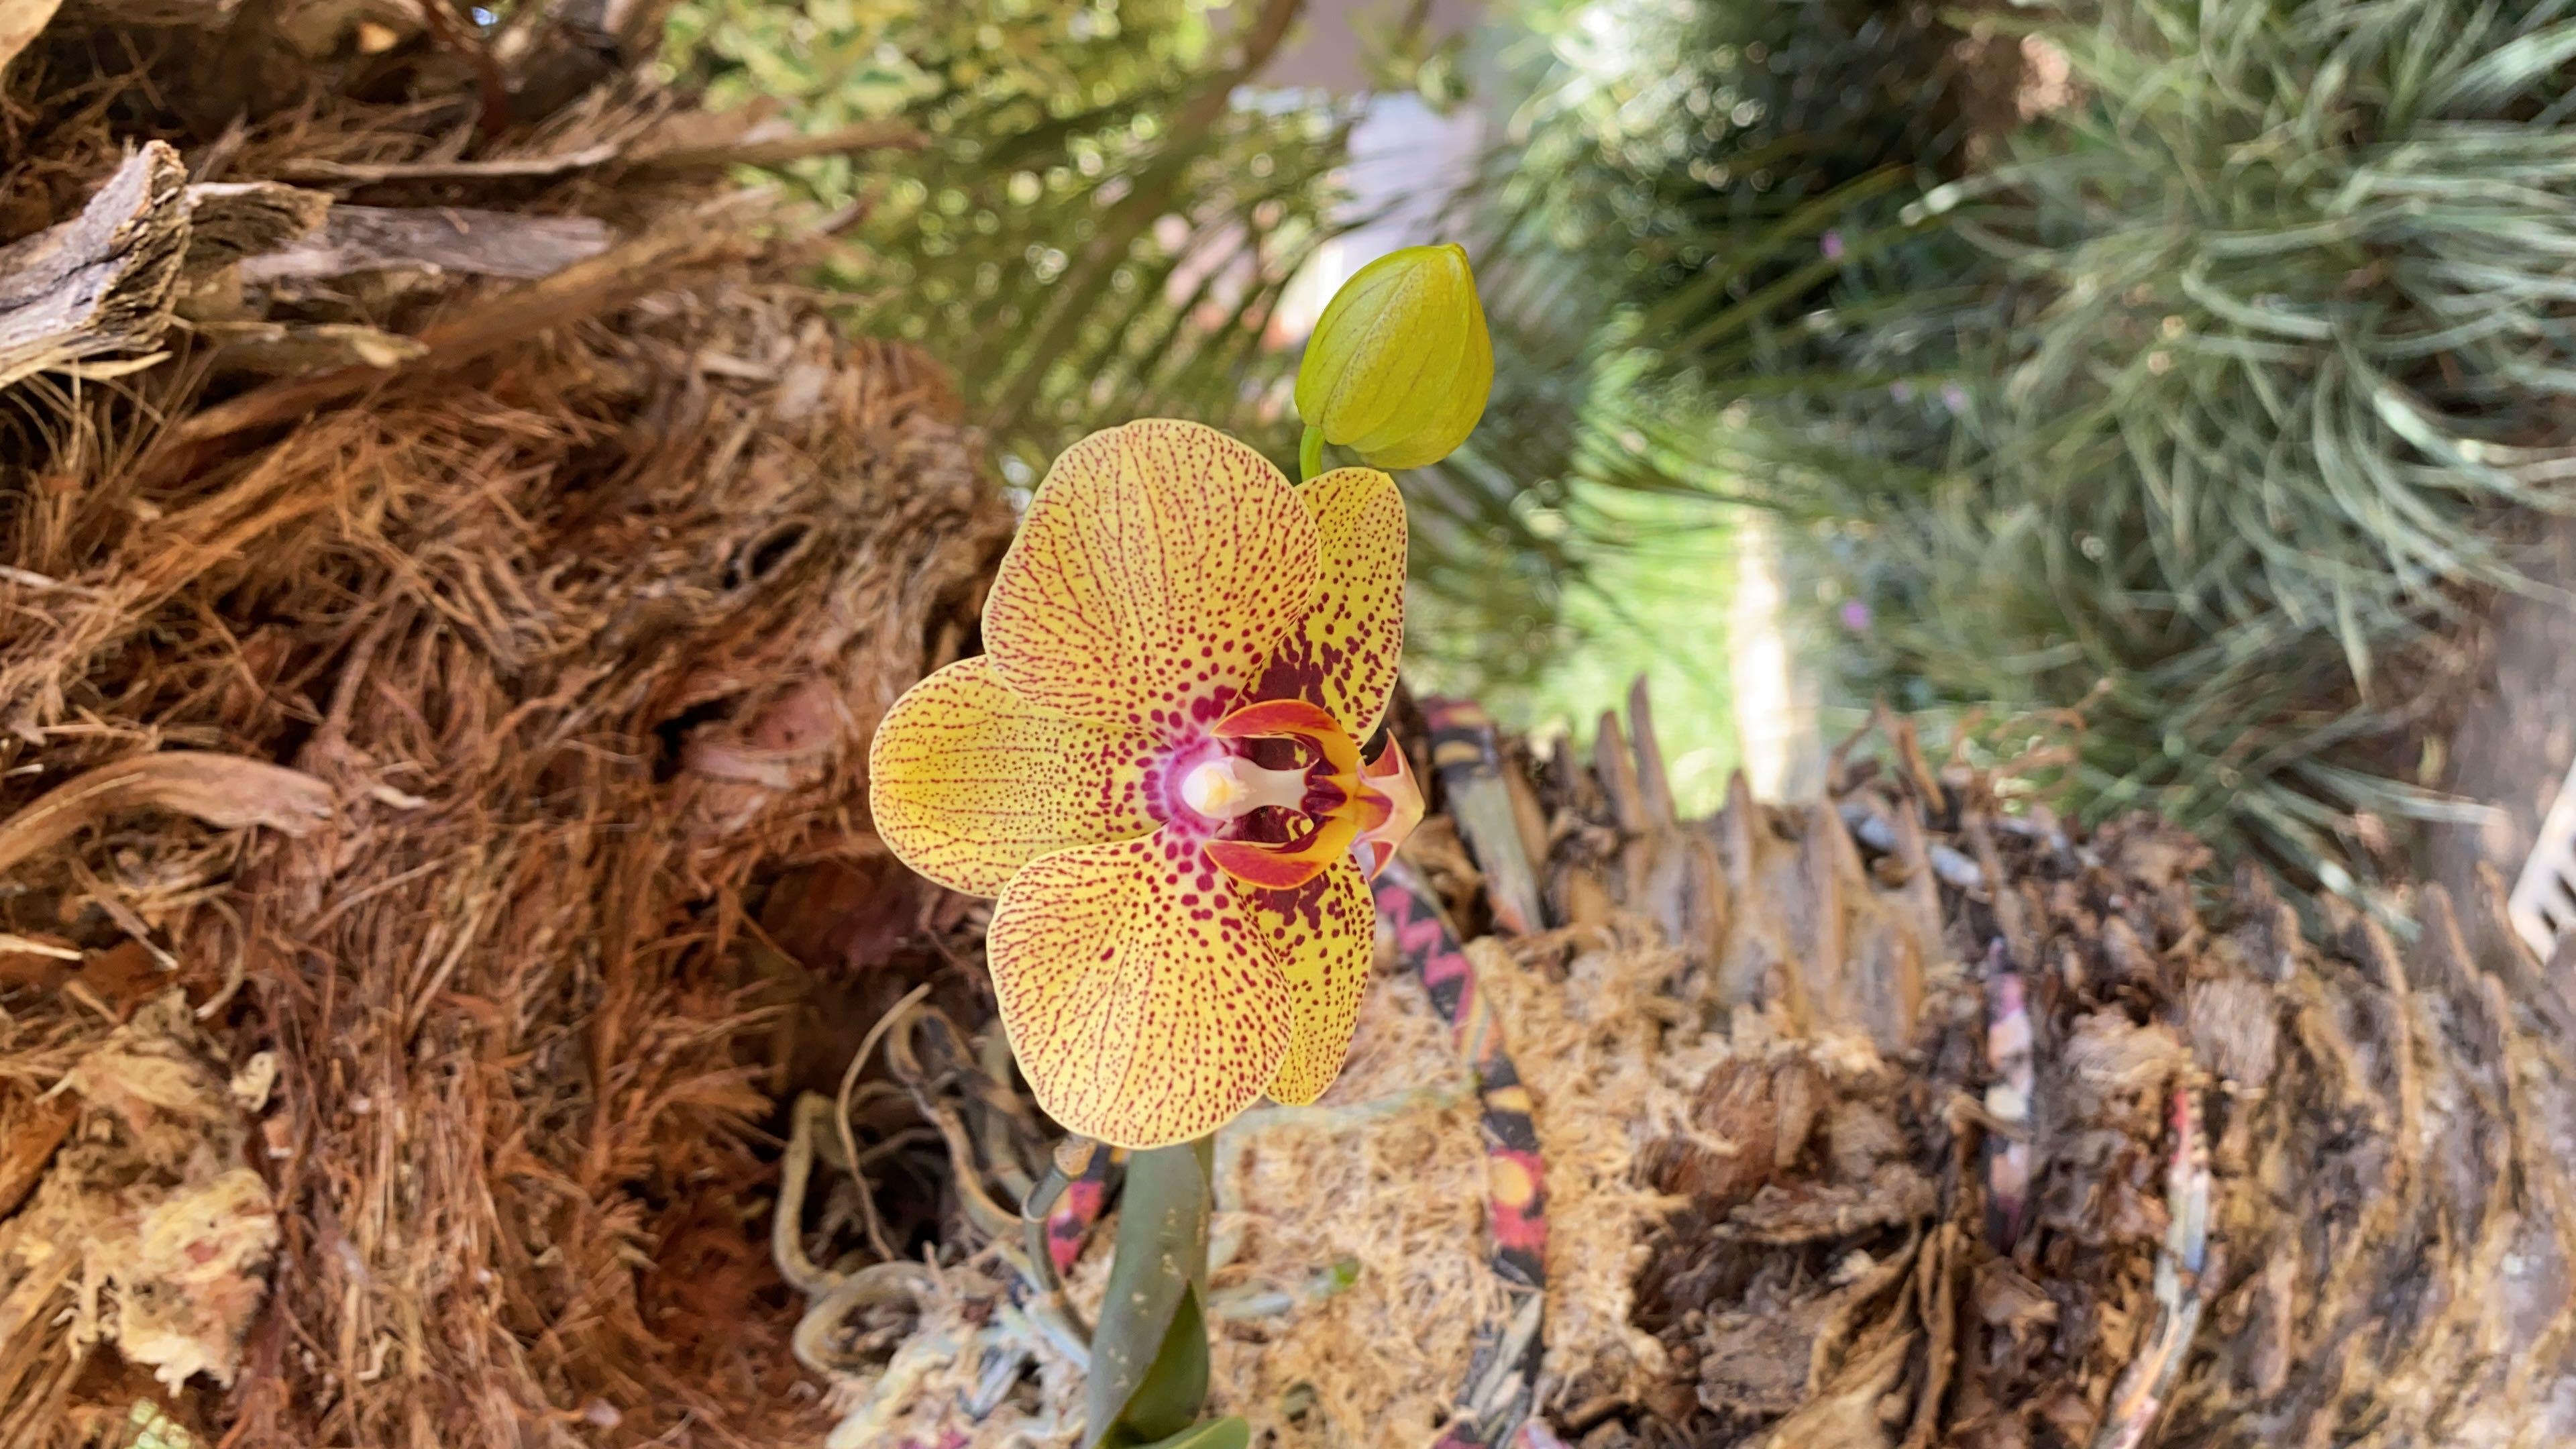 Orquídea transplantada em árvore viva!